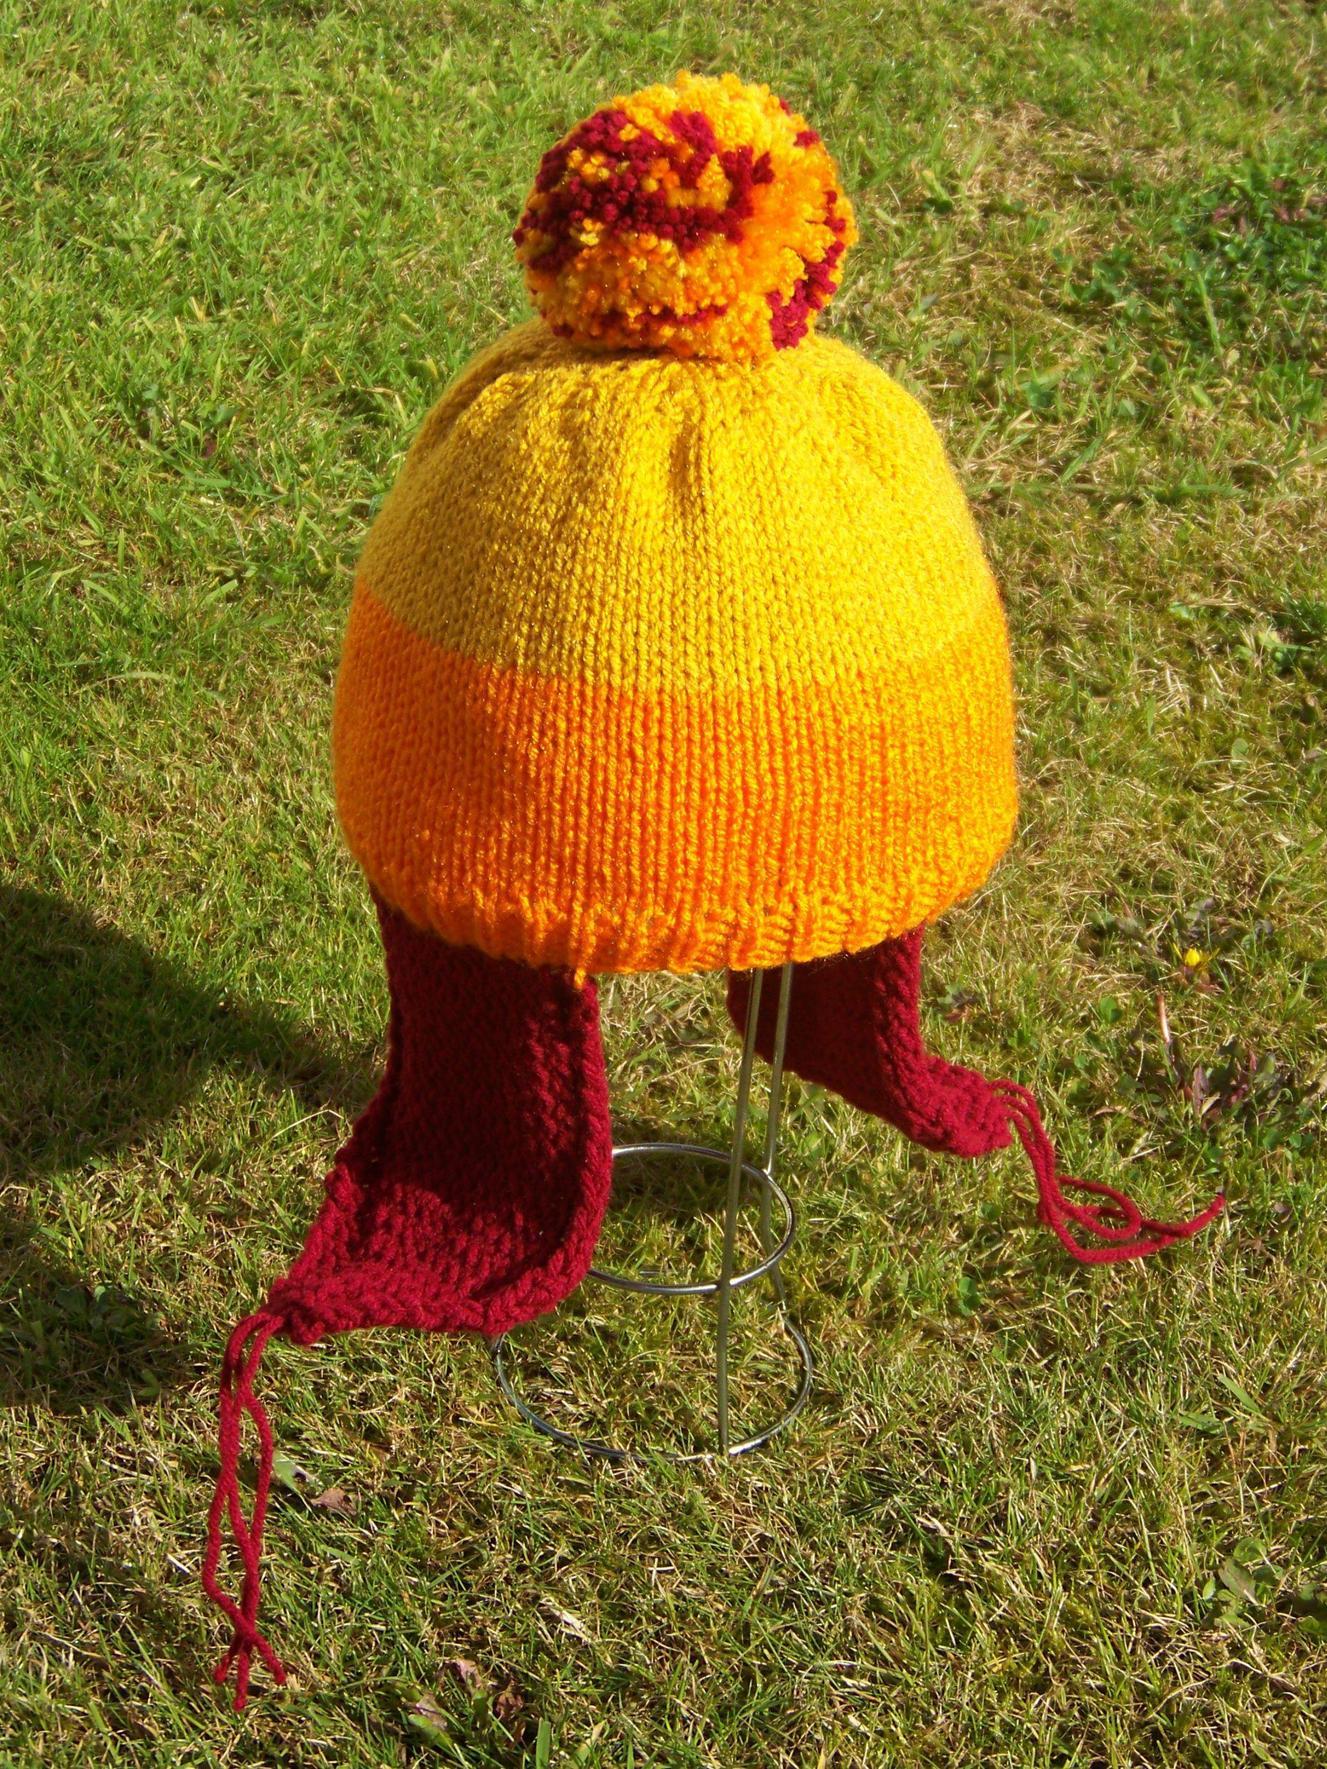 Buy Jayne Cobb\'s Hat from Firefly!| Jayne hats | Cunning Jayne Hat ...